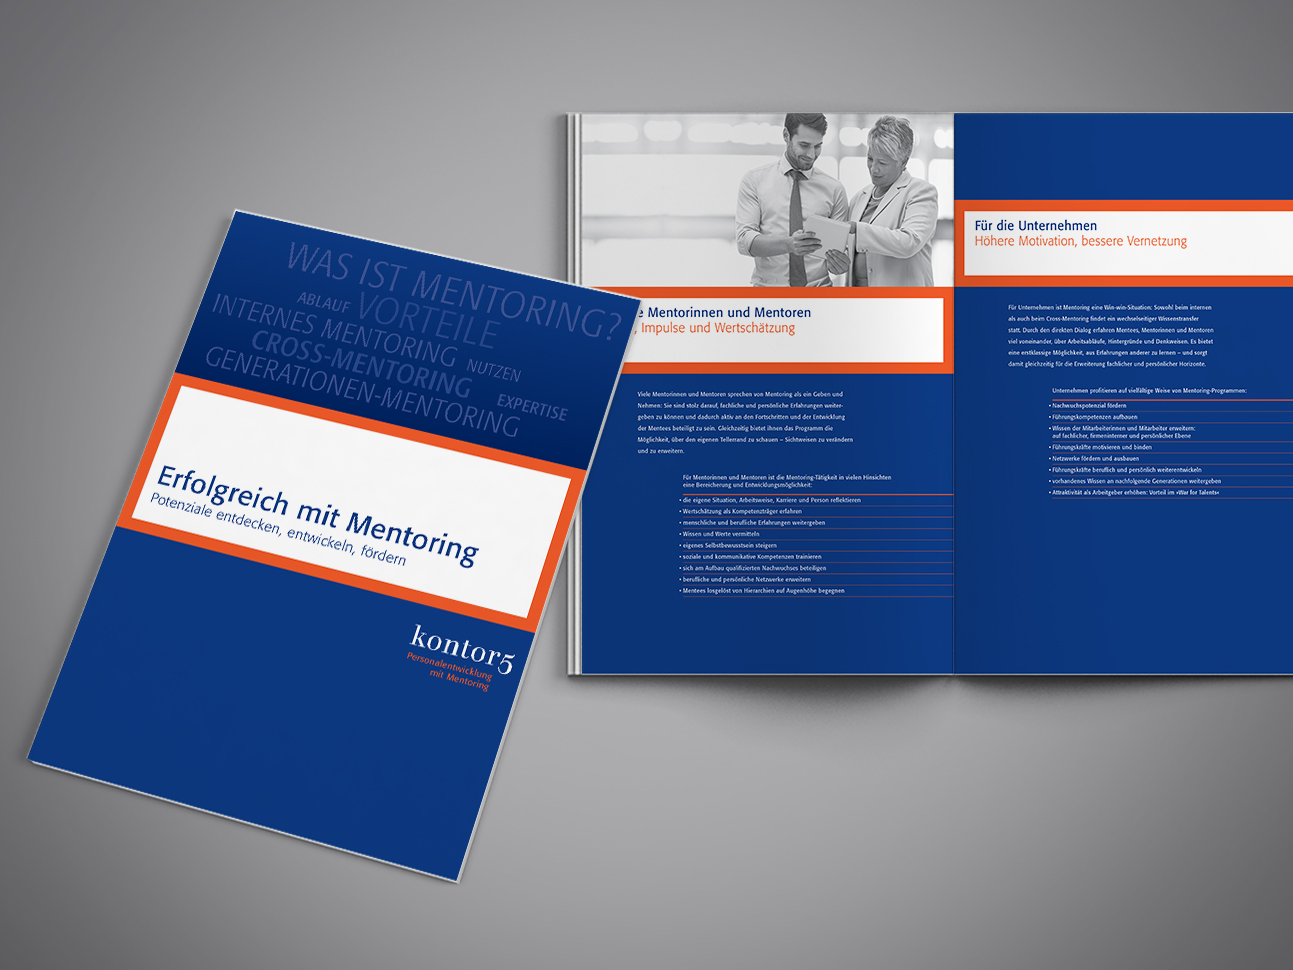 martin_zech_design_corporate_design_kontor5_imagebroschuere_cover_doppelseite